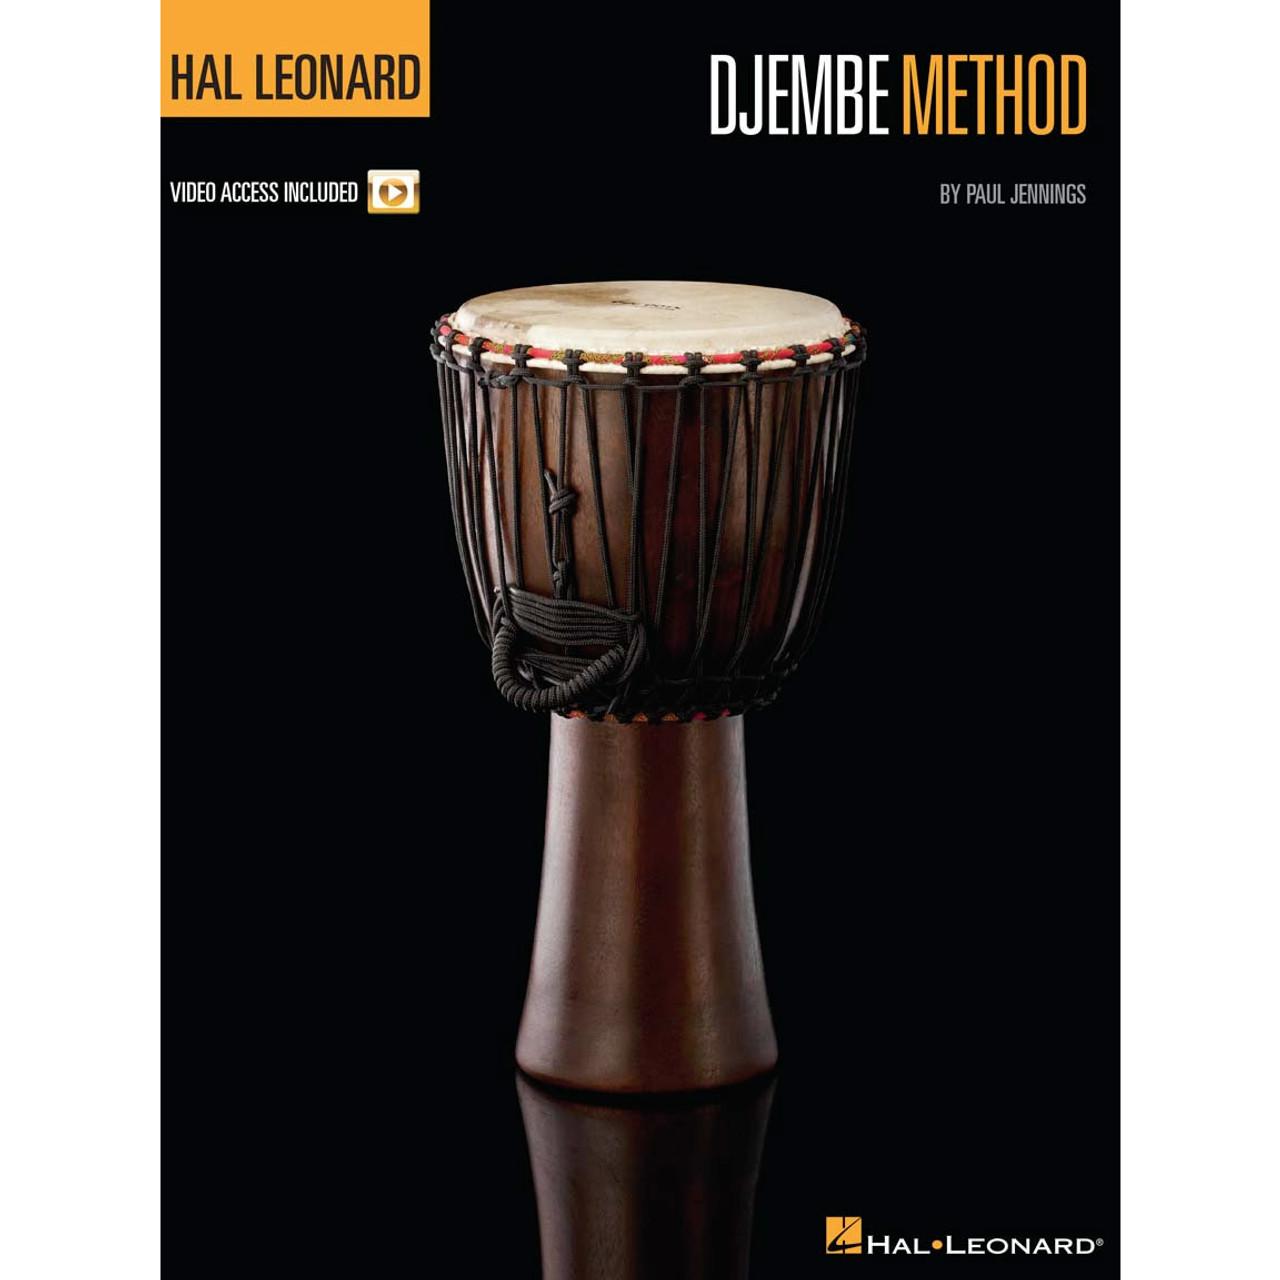 hight resolution of djembe method book video